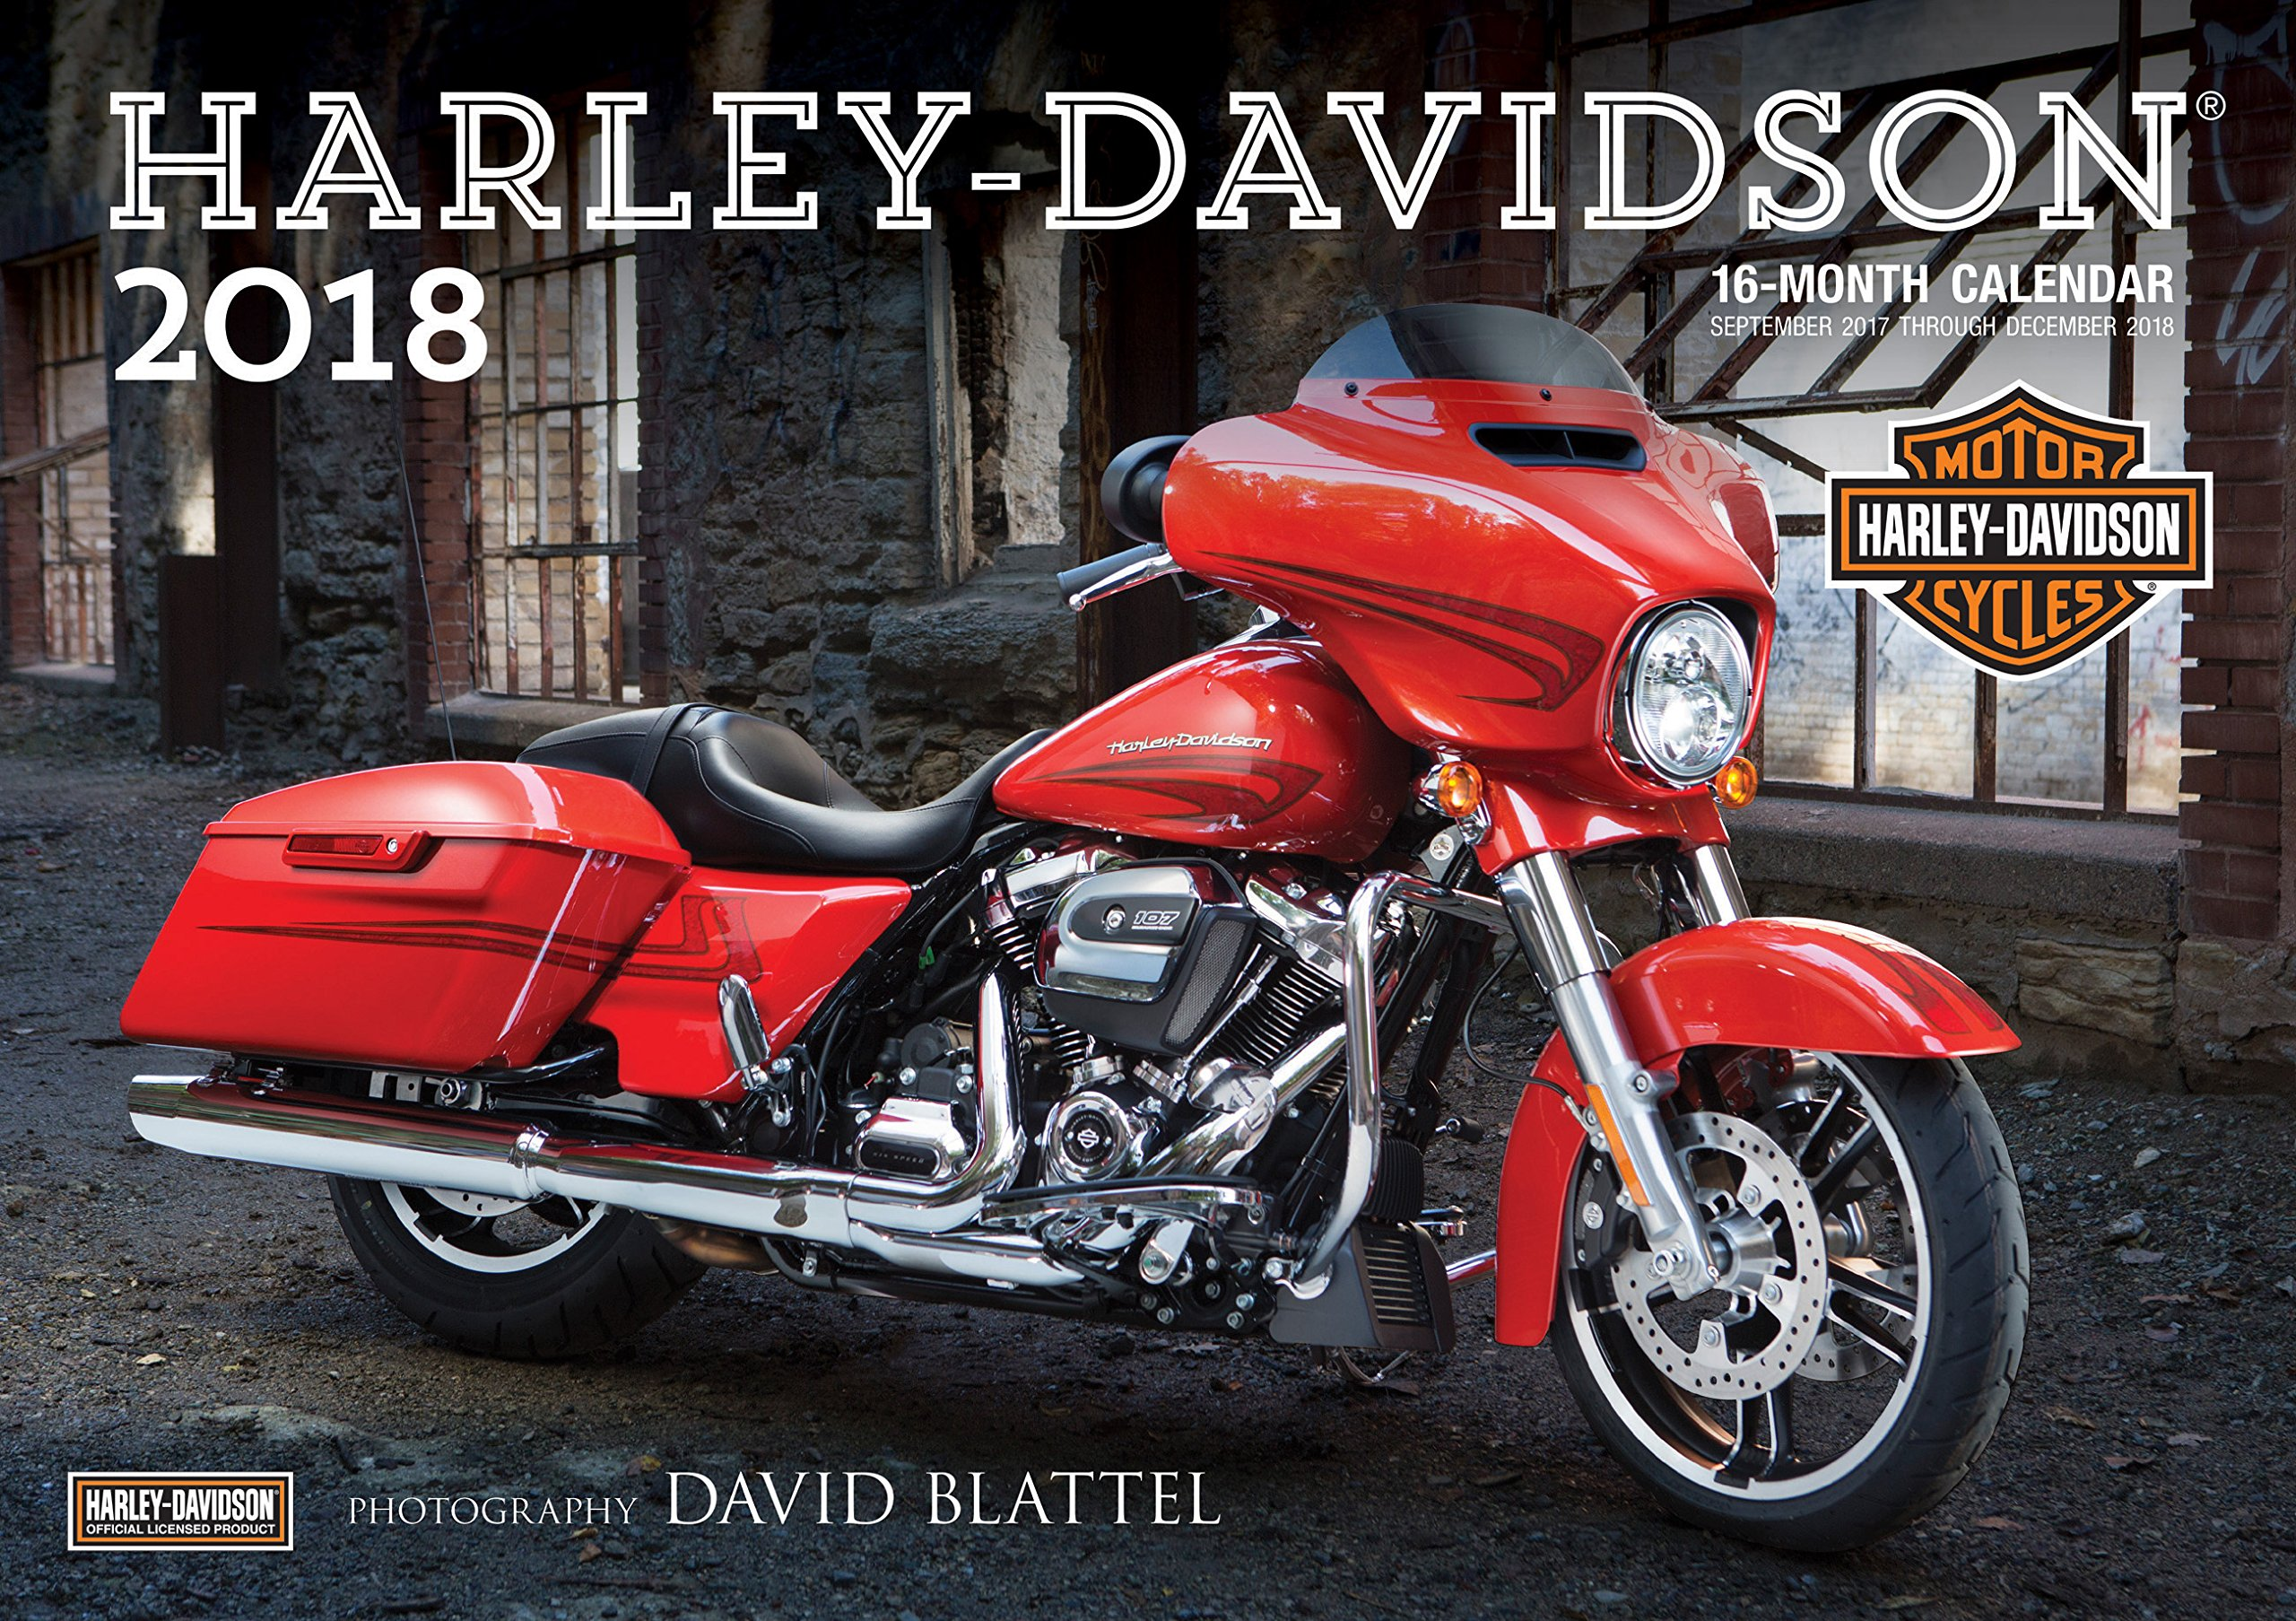 Harley-Davidson(r) 2018: 16-Month Calendar Includes September 2017 through December 2018 PDF